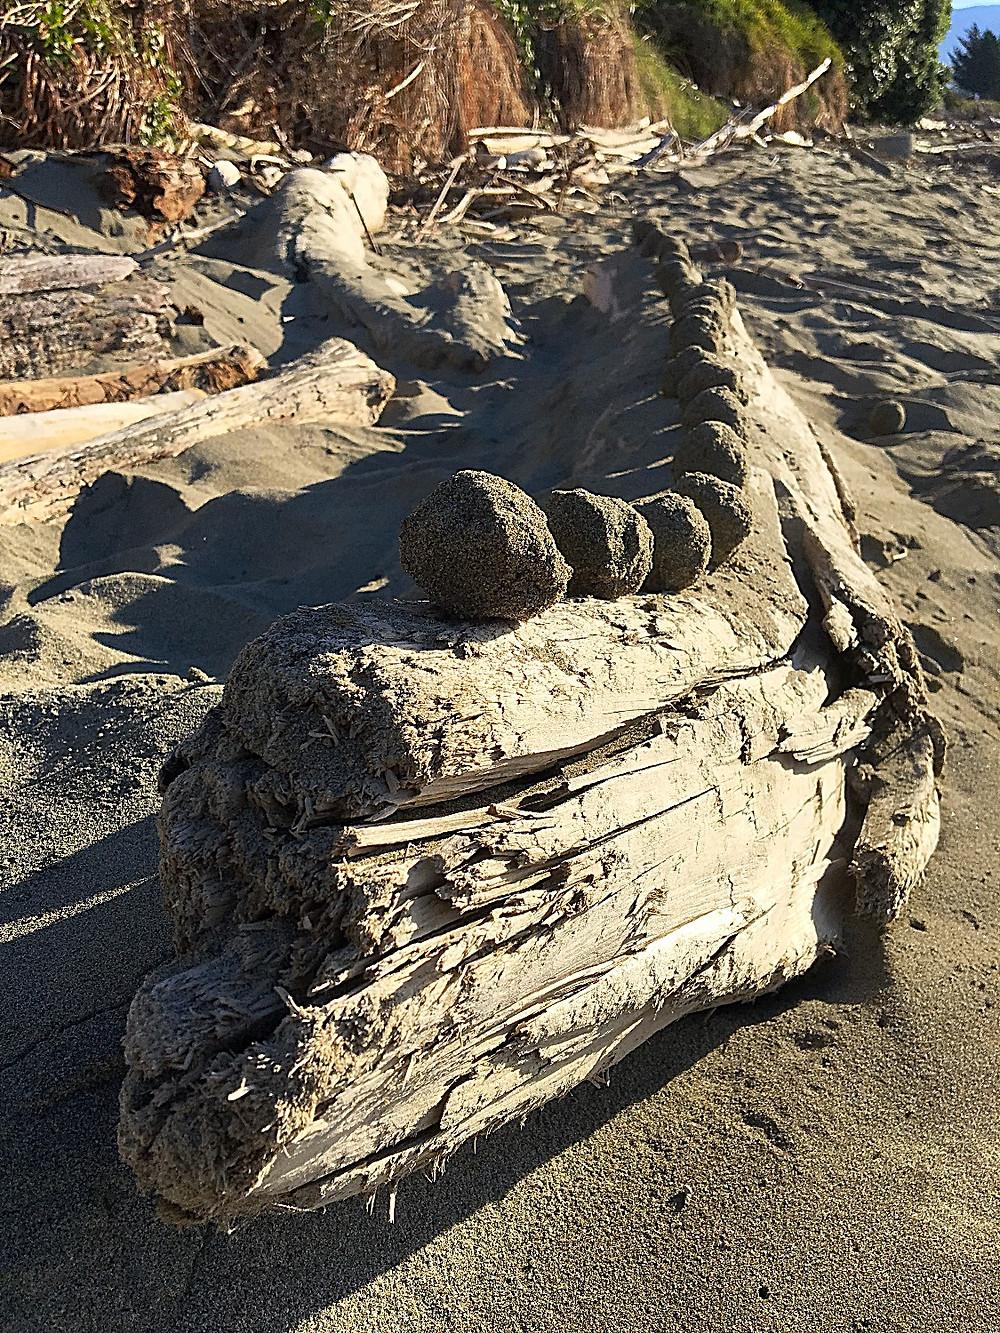 sand balls on a log